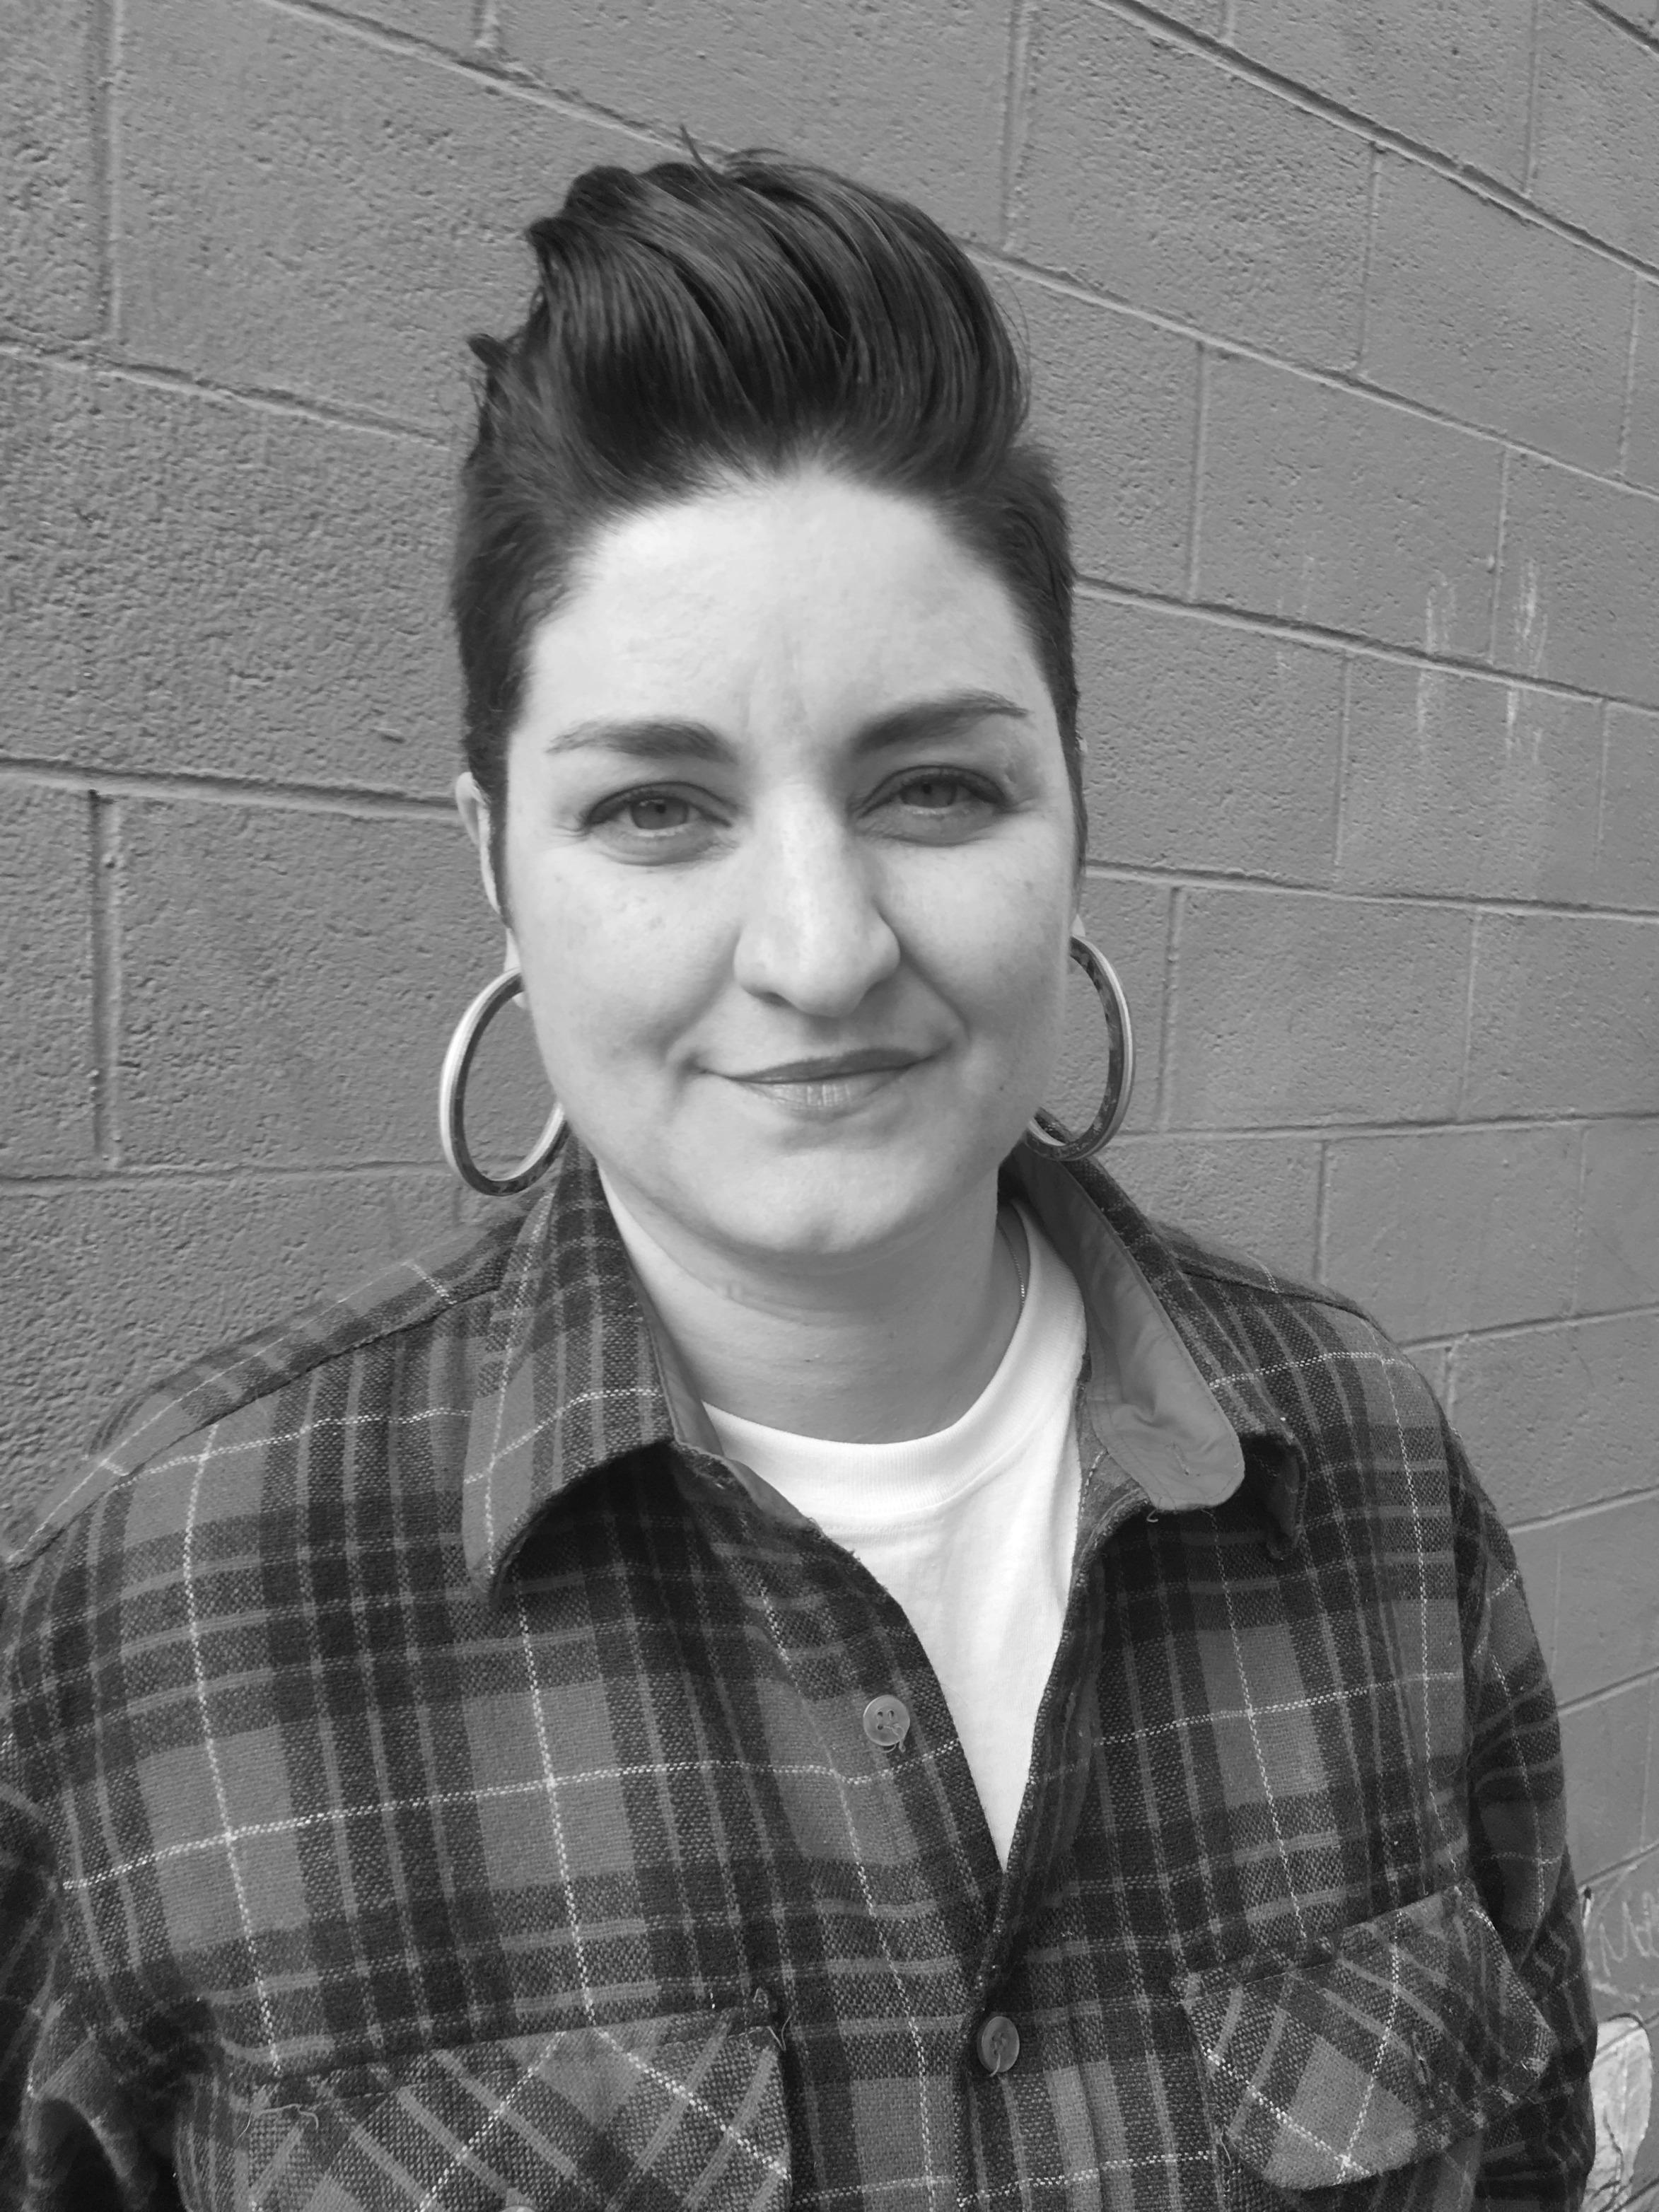 Madison sex therapy | Gina Senarighi